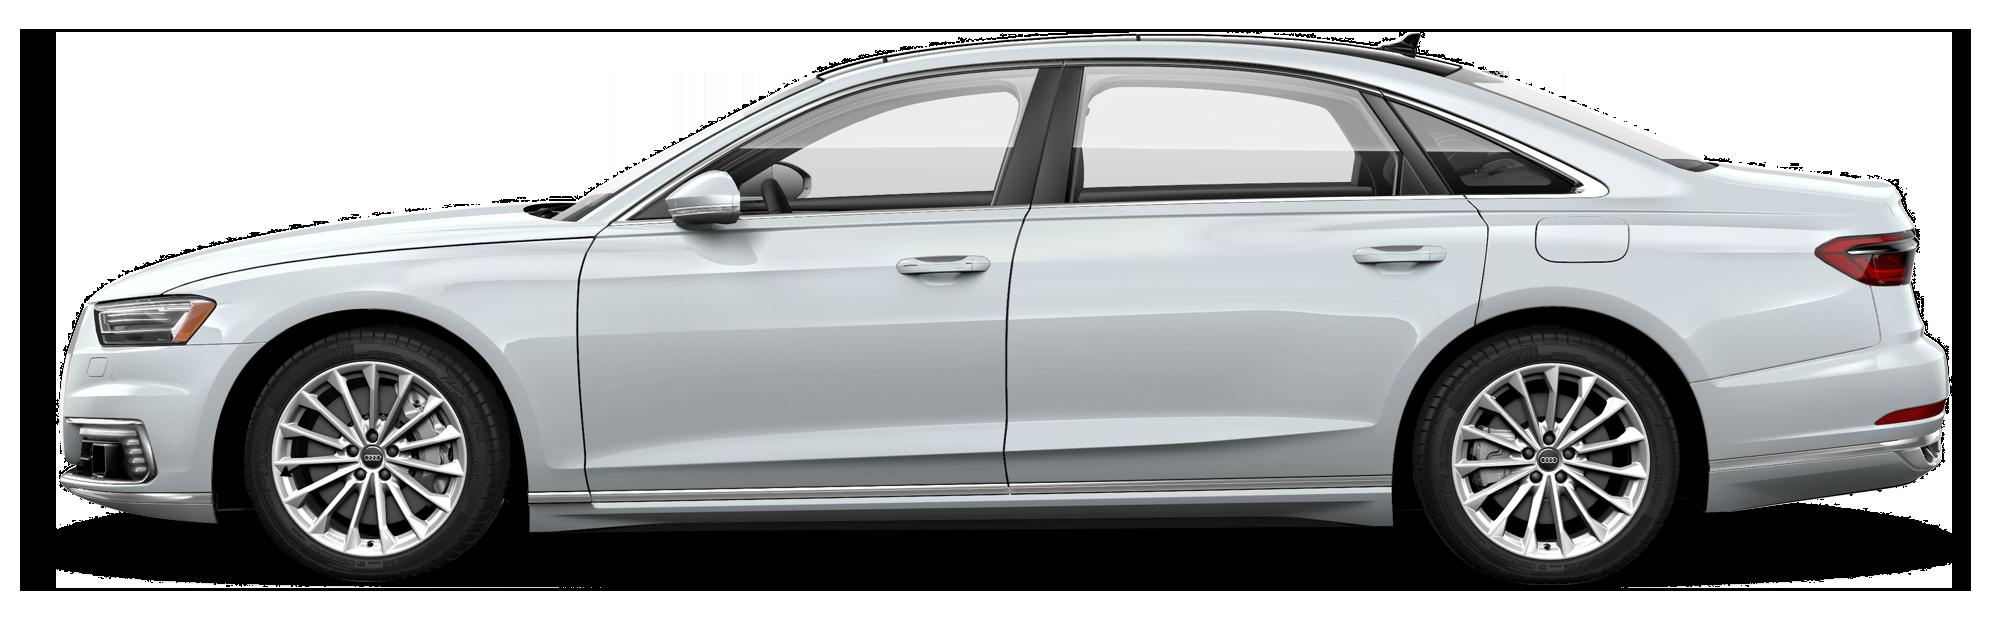 2019 Audi A8 Sedan L 3.0T